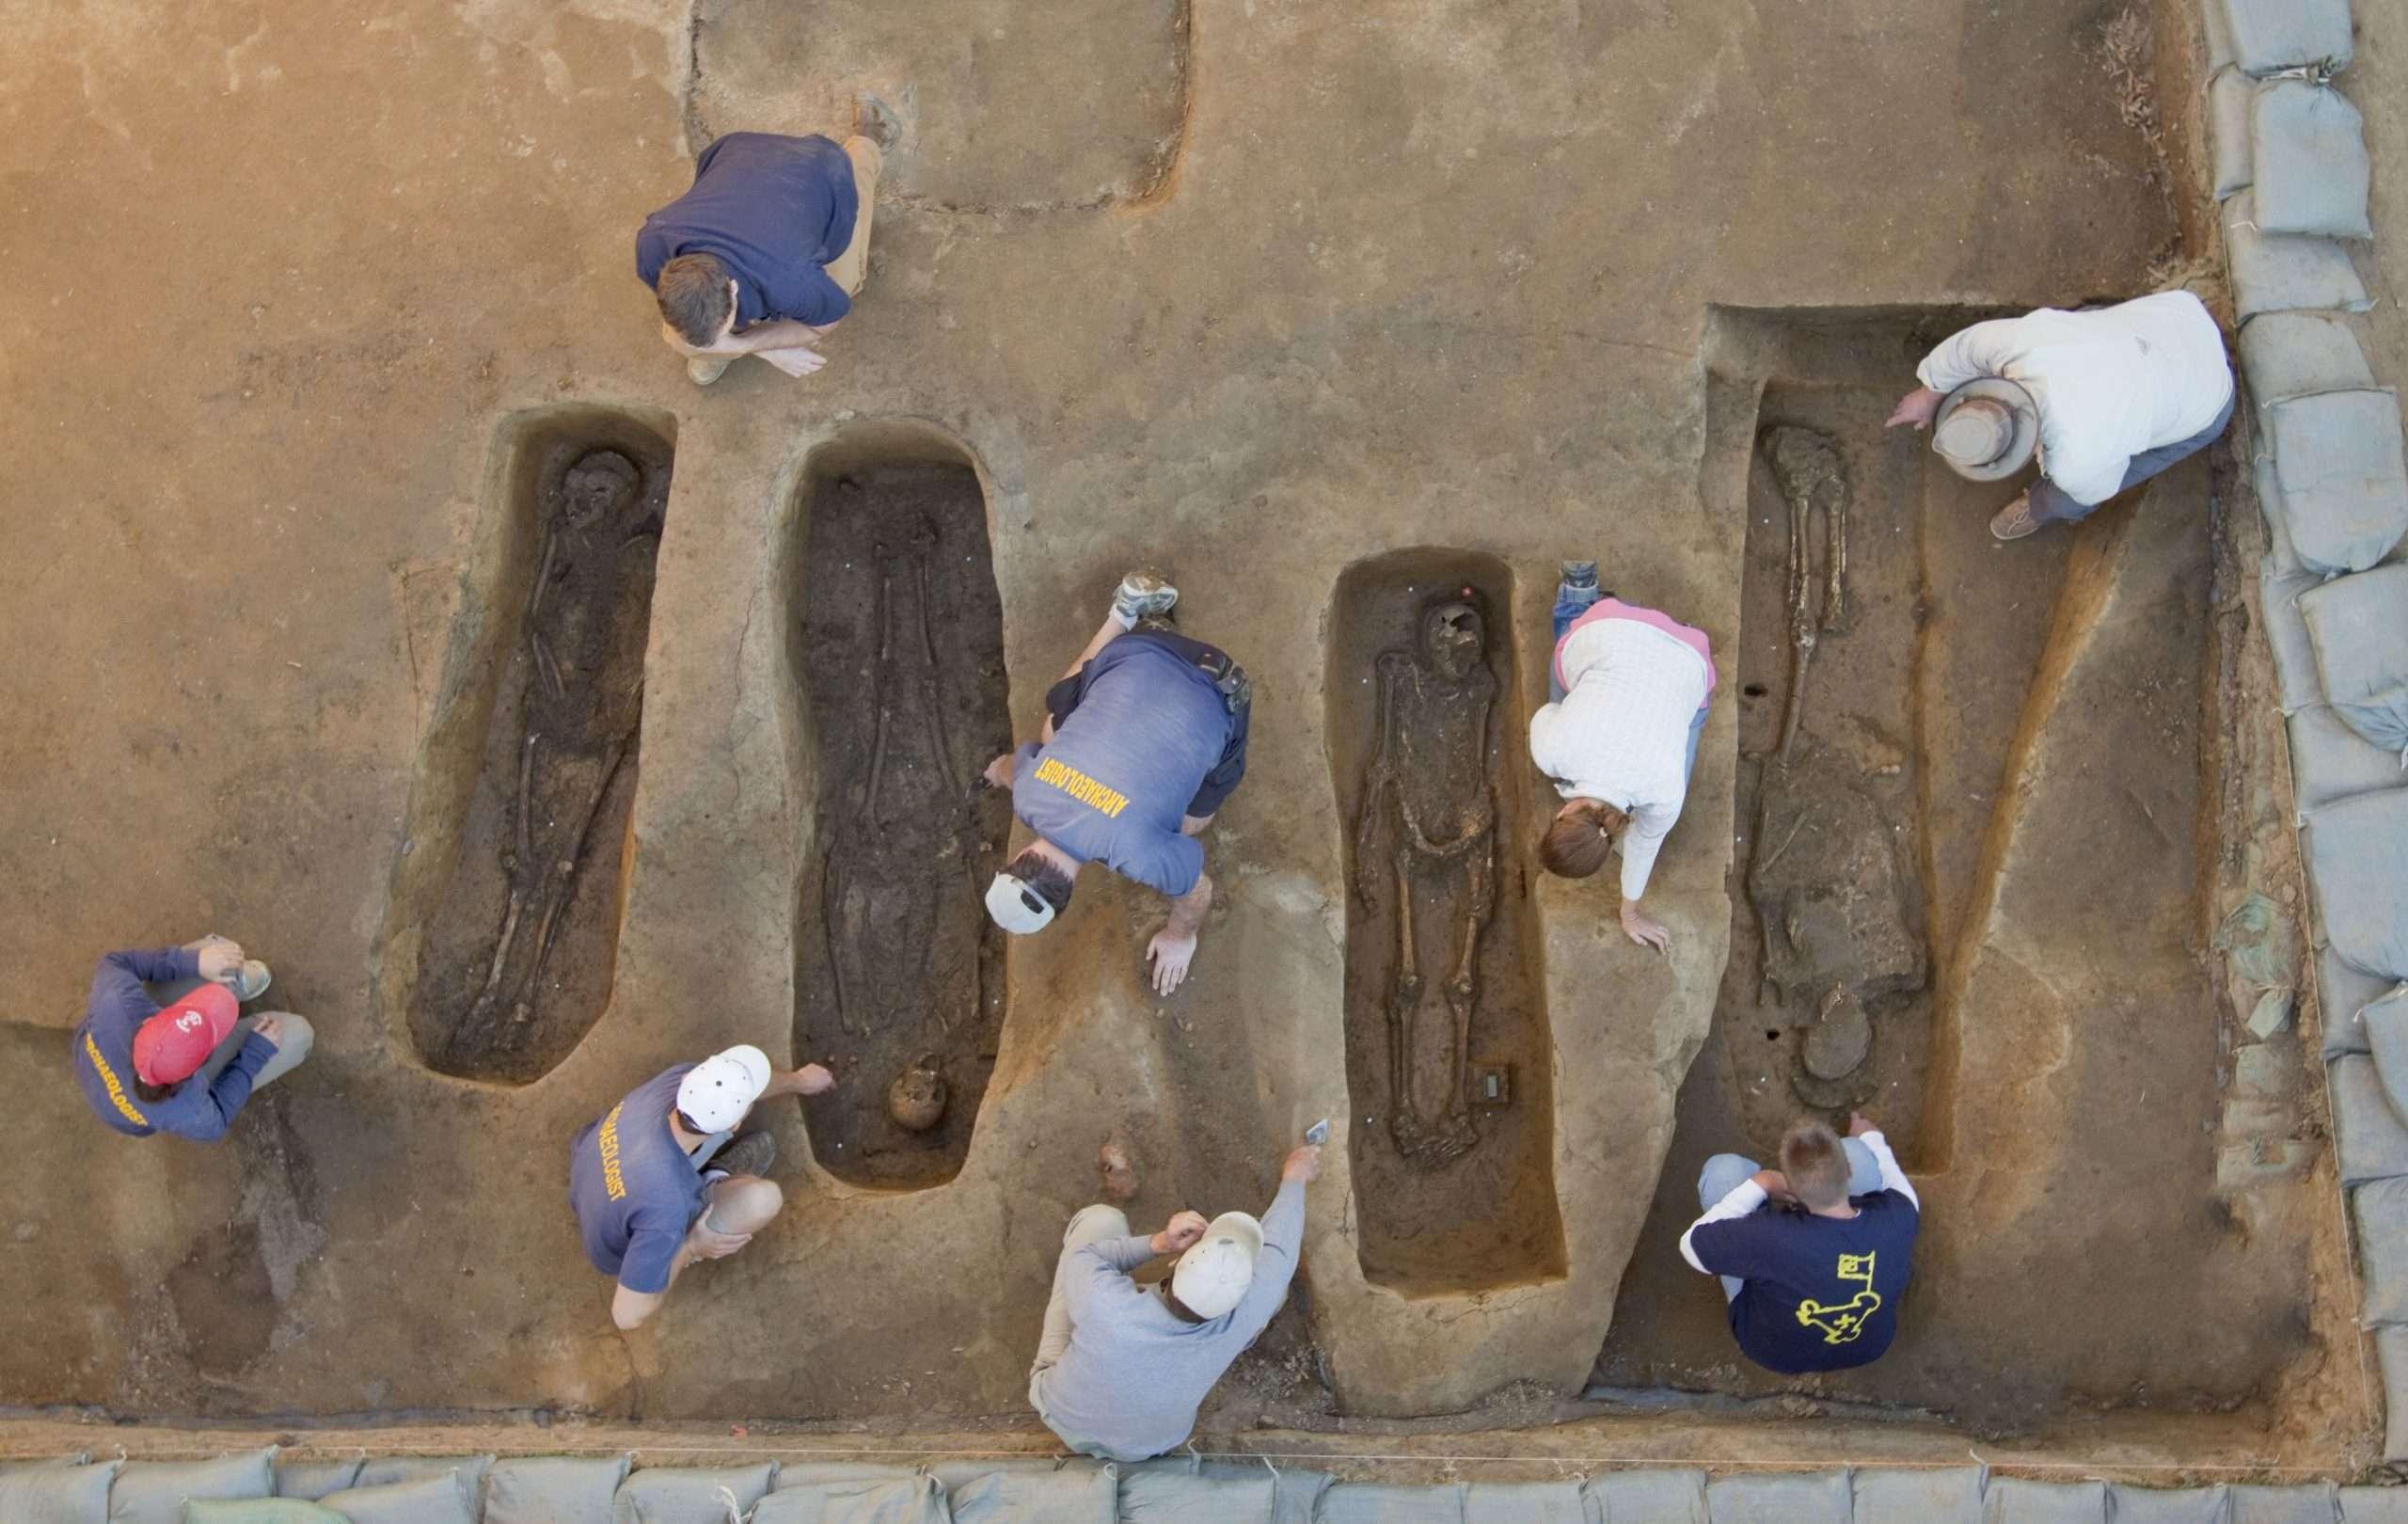 Gravesites in the 1608 Church at Jamestown